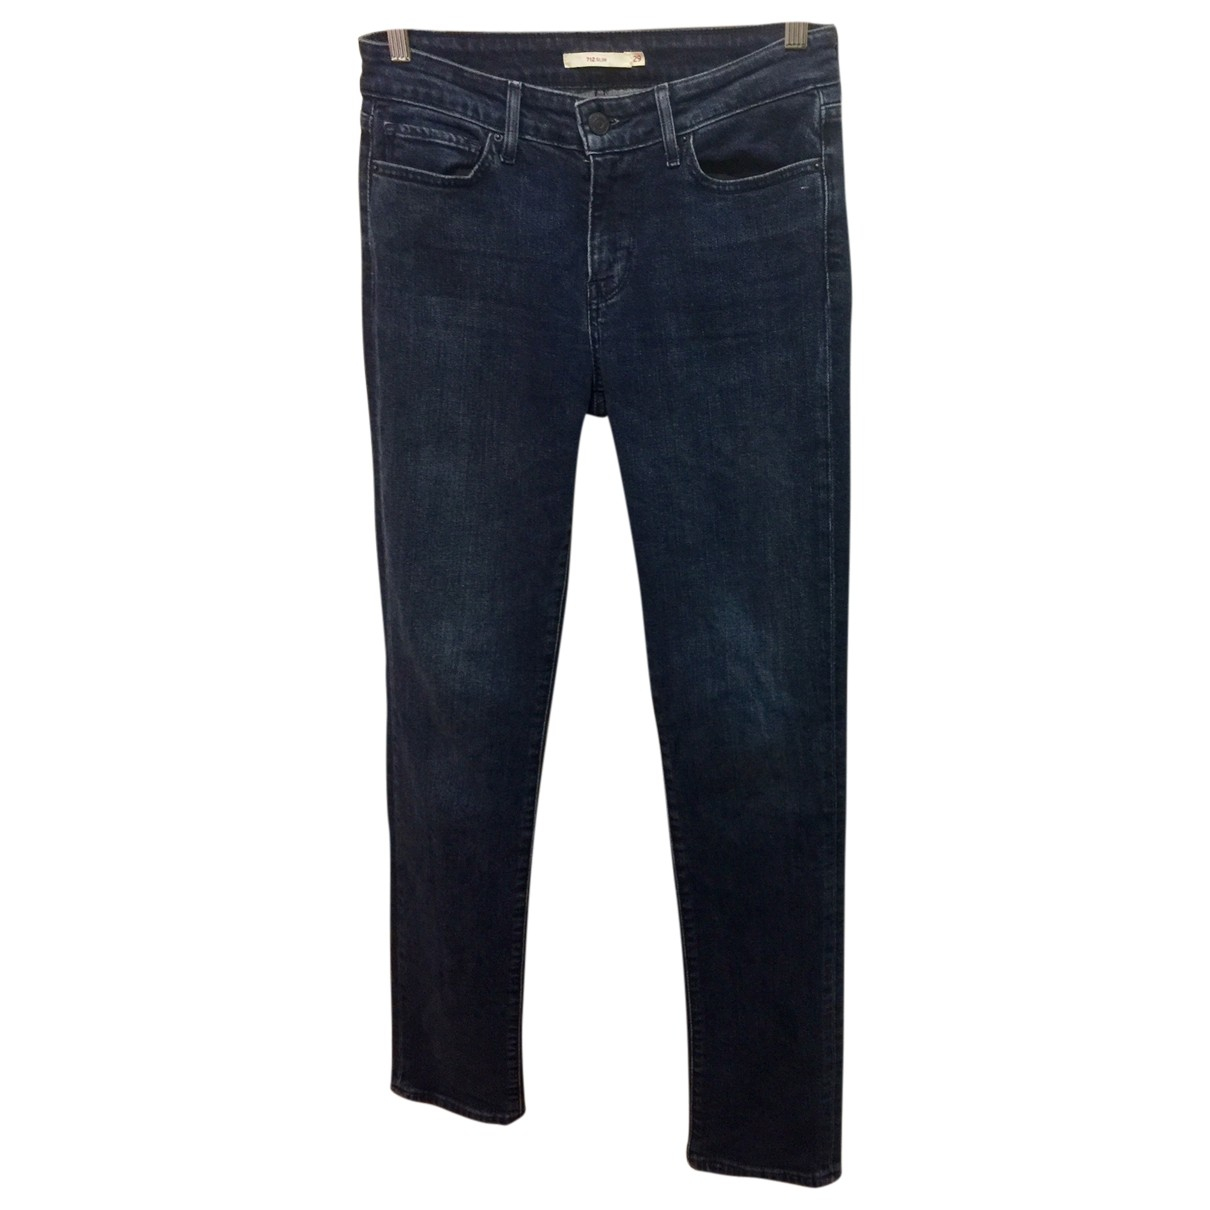 Levi's 712 Blue Cotton - elasthane Jeans for Women 29 US